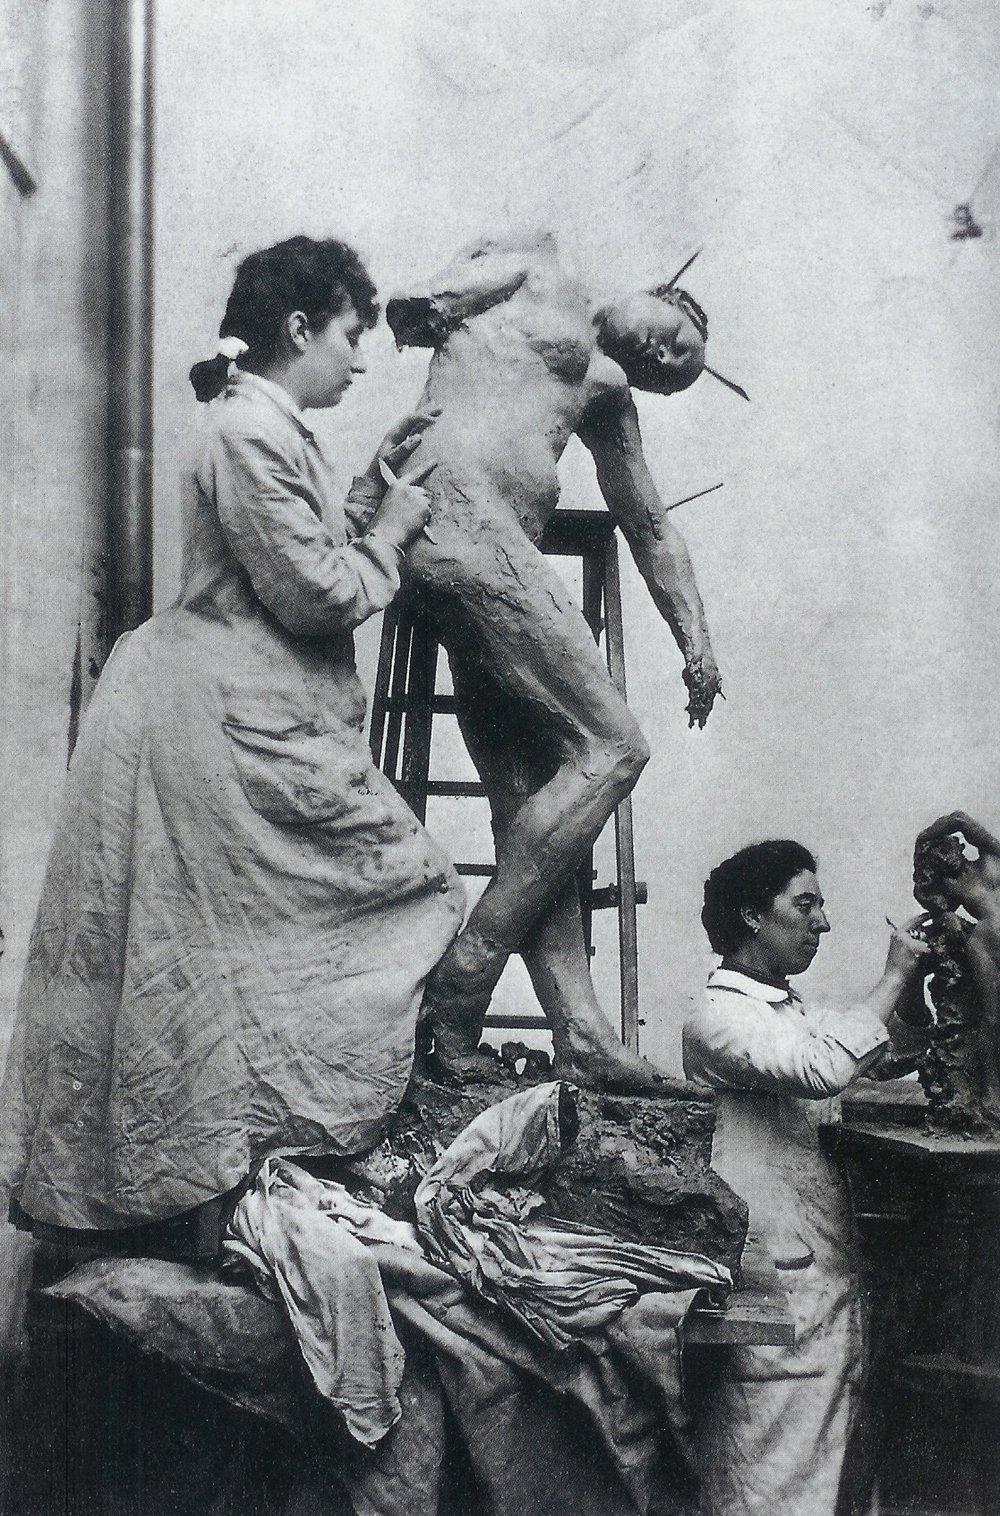 Camille e Rodin no estúdio, onde viveram história conturbada de amor entre 1886 a 1893